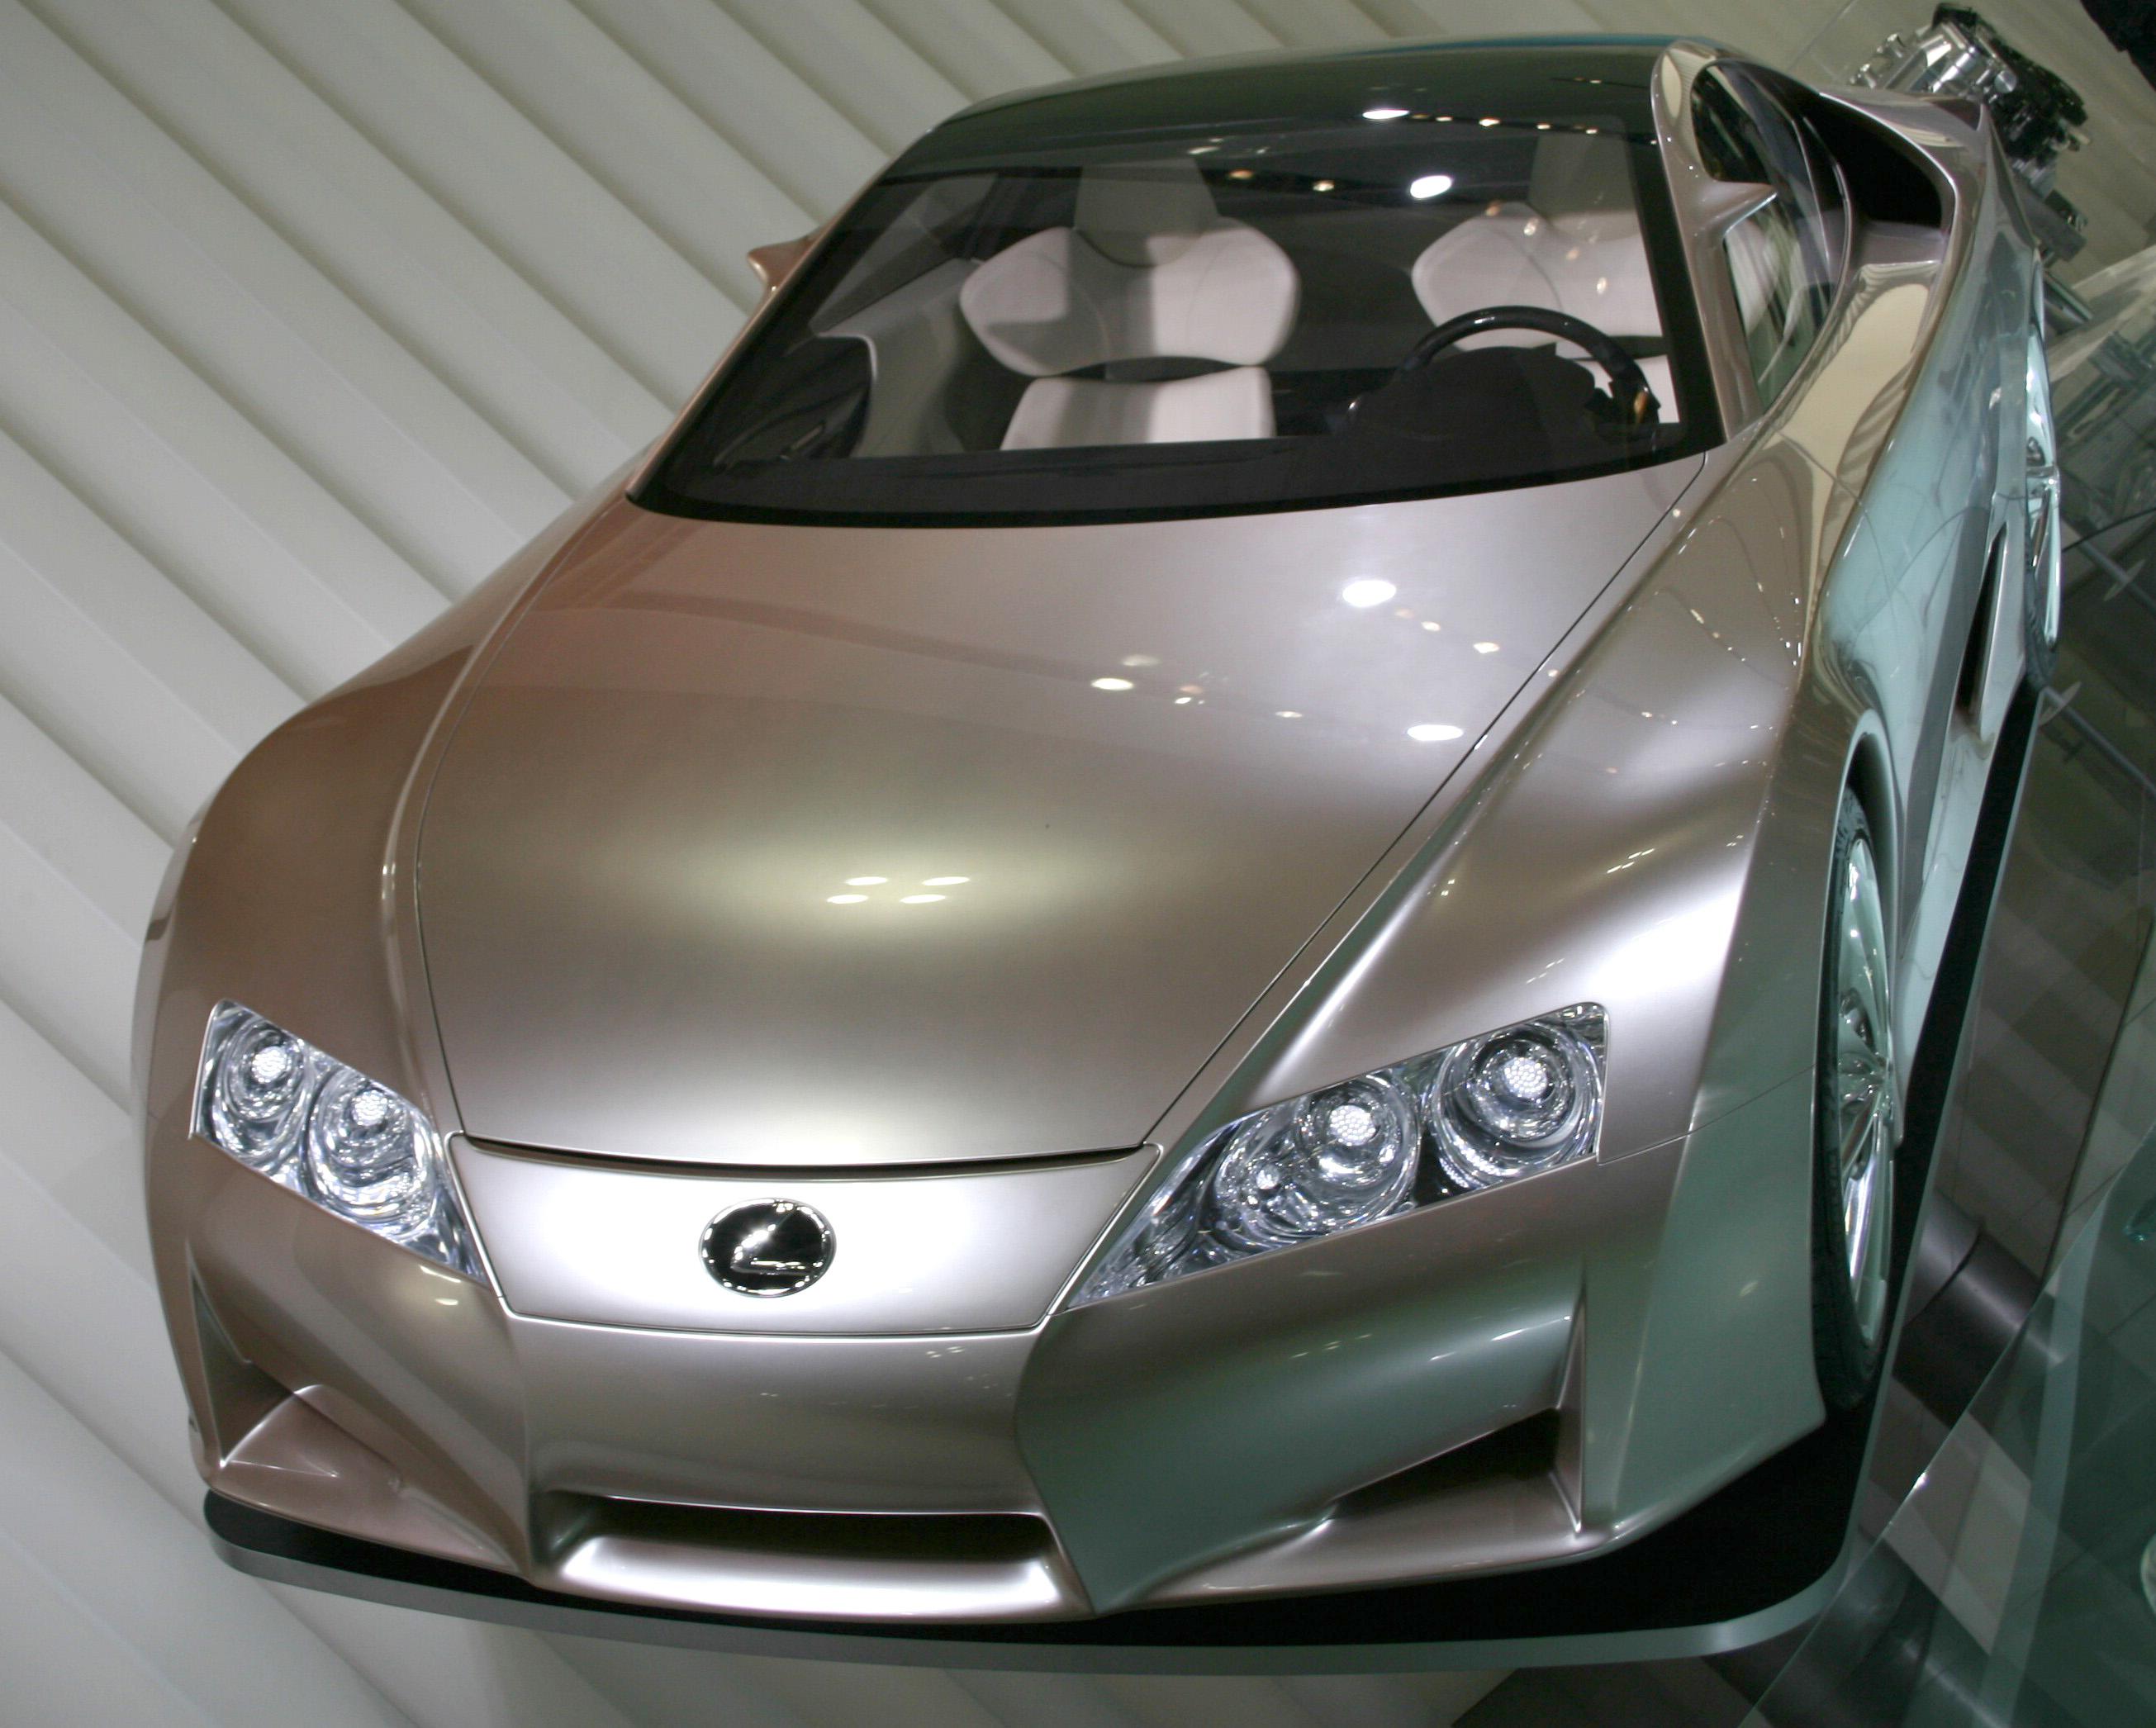 https://upload.wikimedia.org/wikipedia/commons/8/8a/Lexus_LF-A_2005_TMS_1.jpg